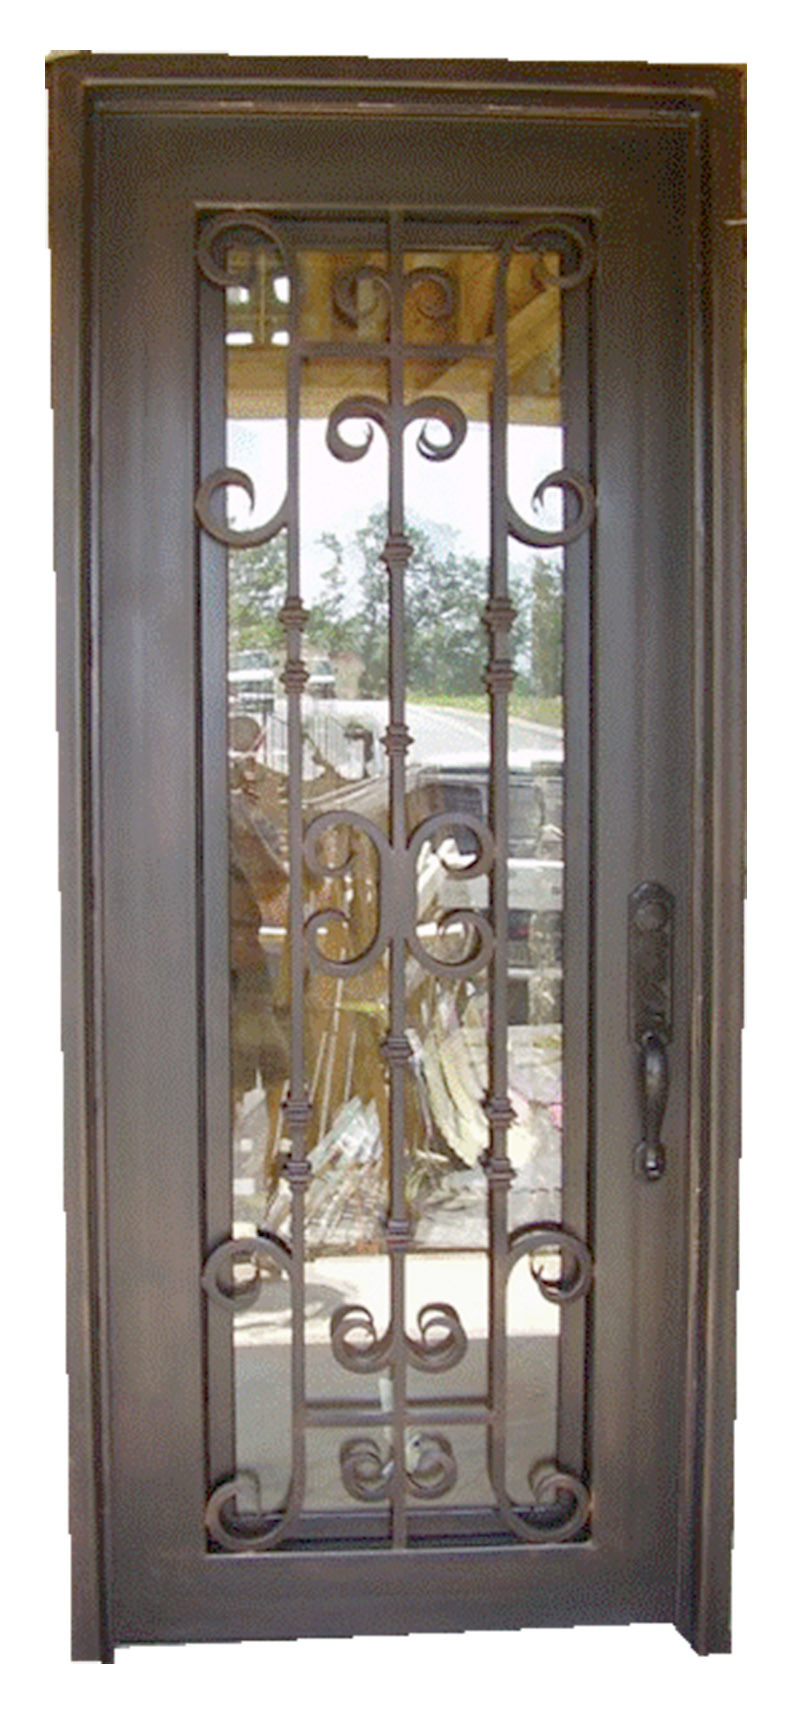 China Wholesales Interior Wrought Iron America Cellar Entry Door